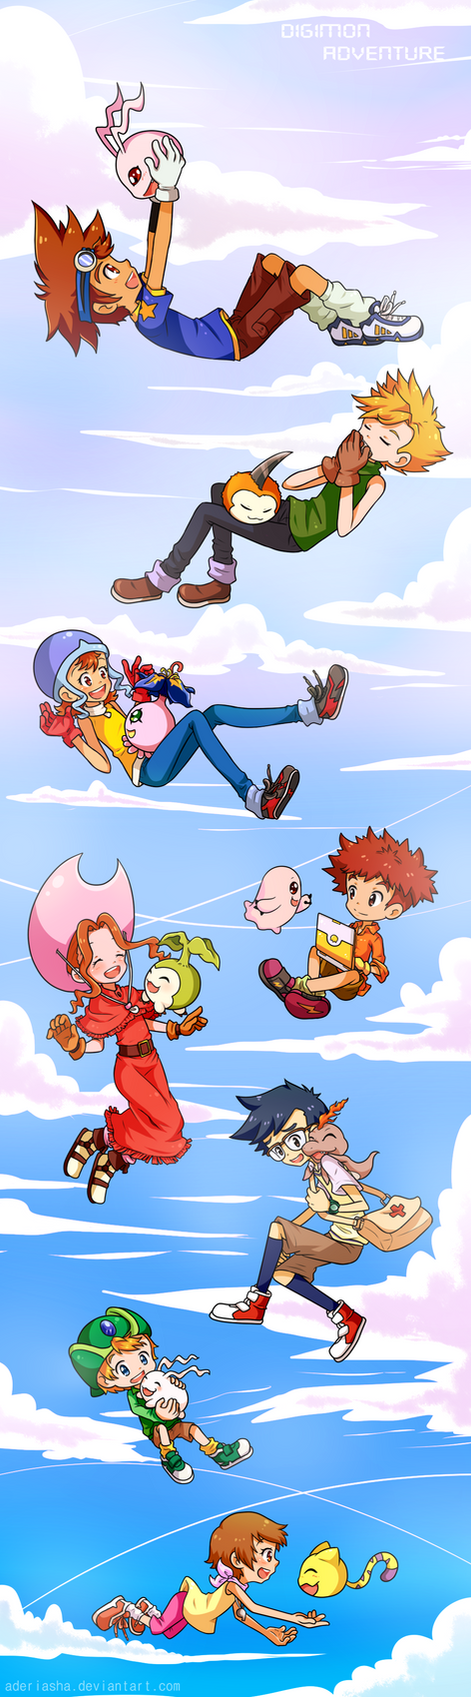 Digimon 15th Anniversary by AderiAsha